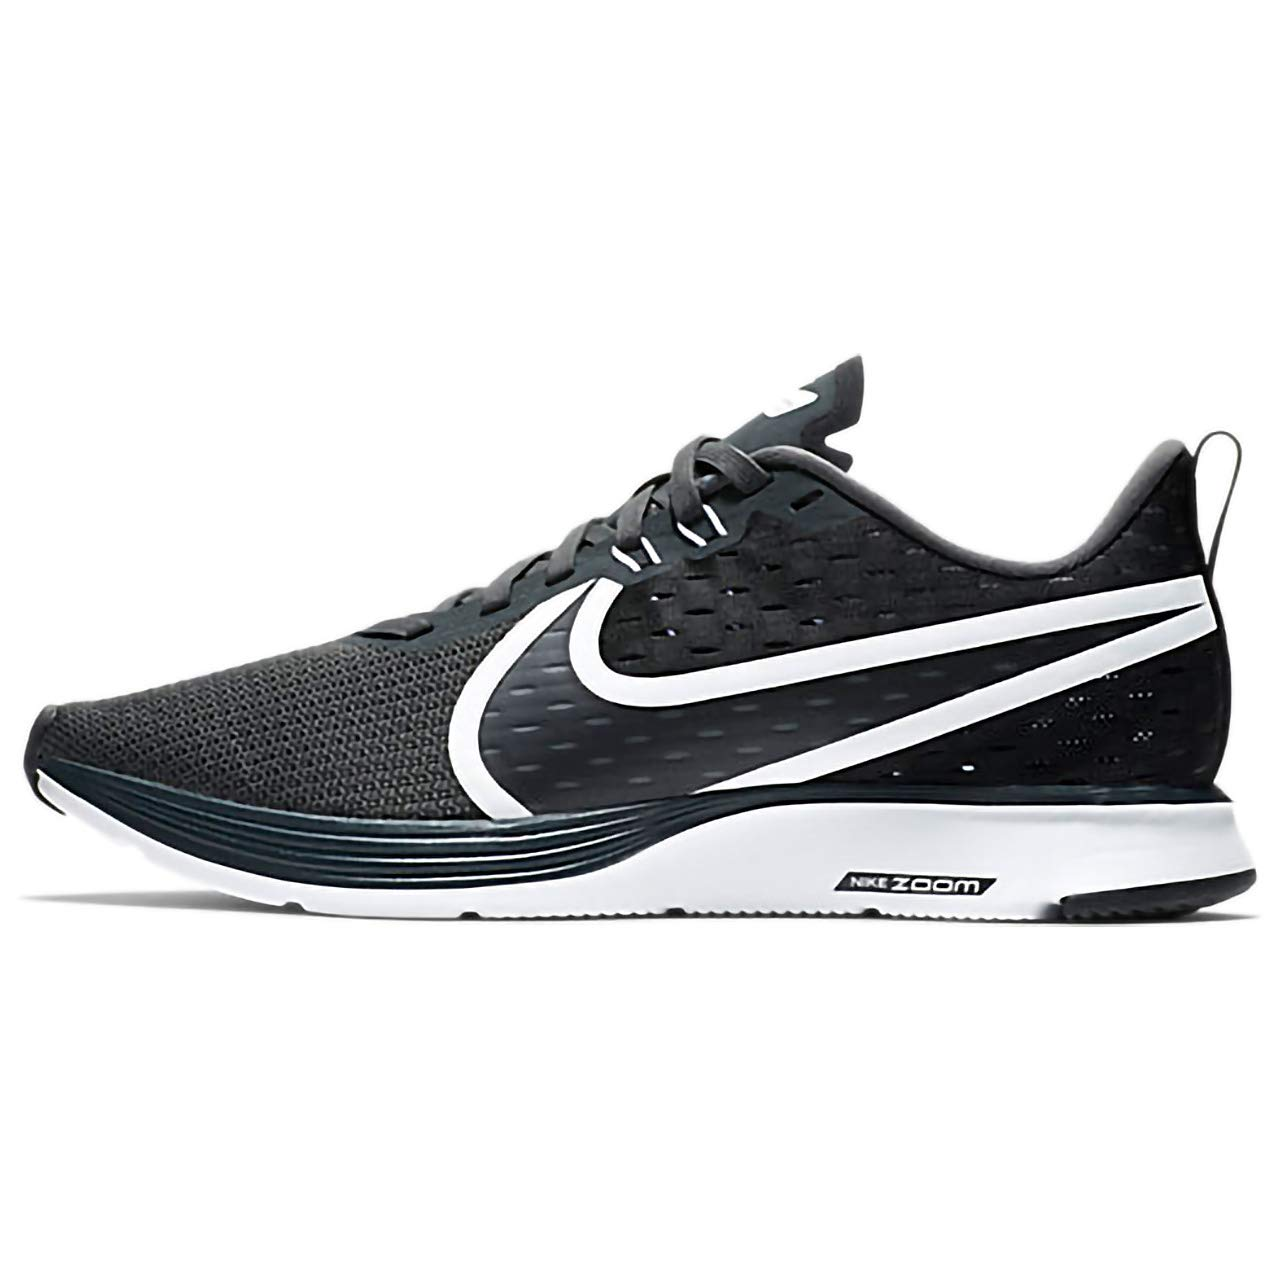 Noir (noir Anthracite blanc 001) Nike WMNS Zoom Strike 2, Chaussures de Running Compétition Femme 44.5 EU